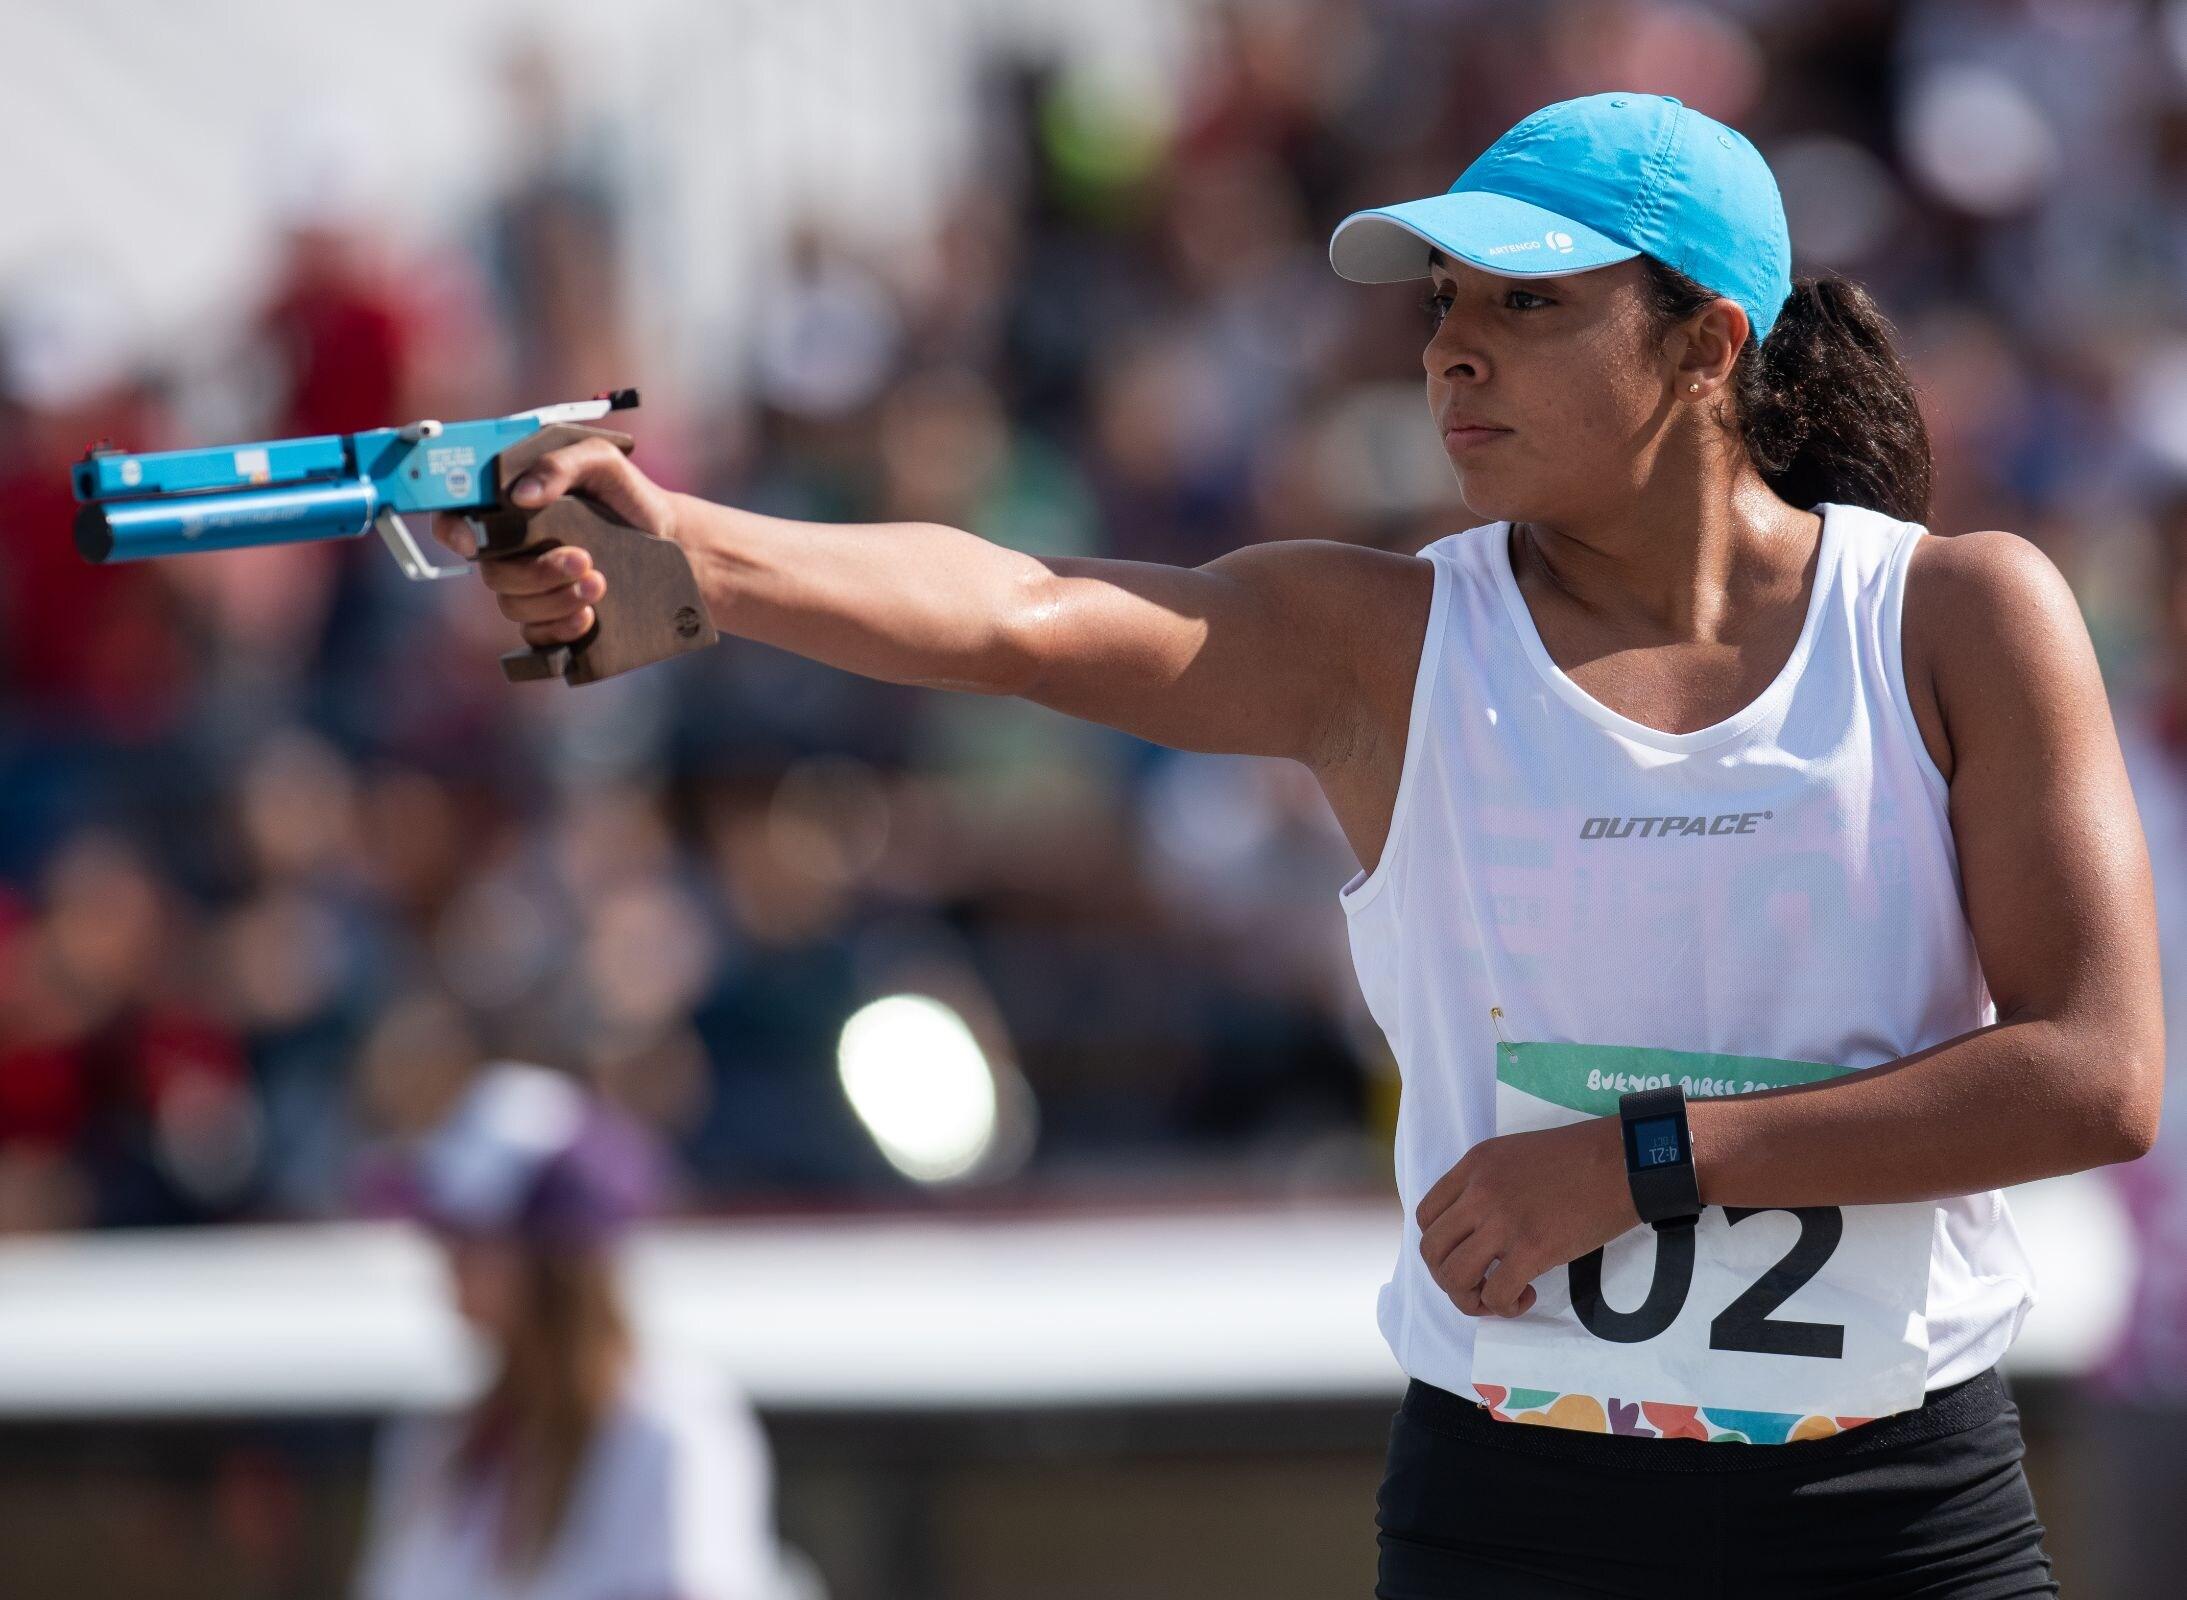 Buenos Aires 2018 - Pentathlon moderne - Epreuve individuelle femmes